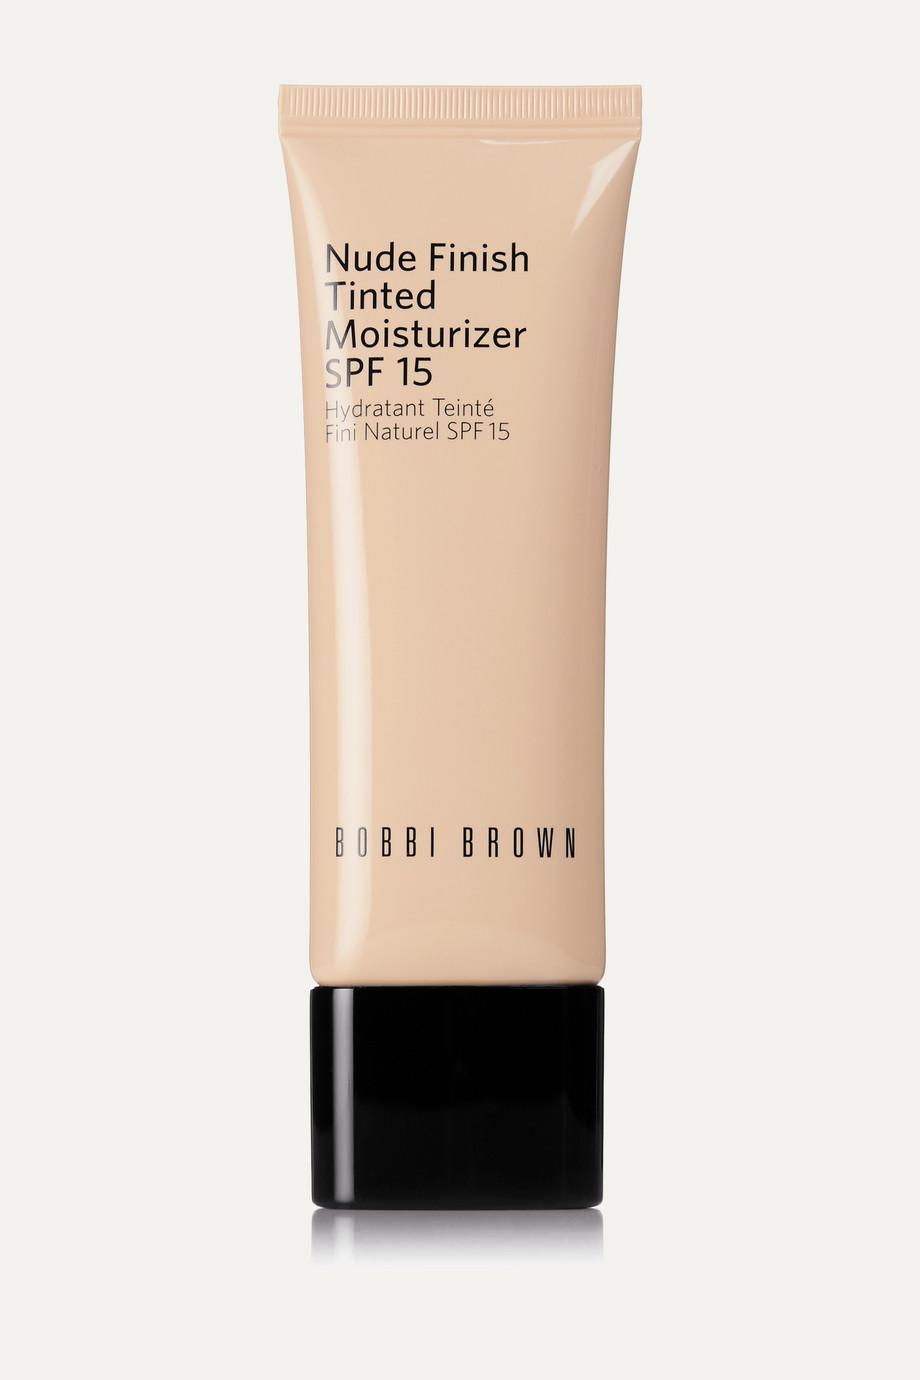 Bobbi Brown Nude Finish Tinted Moisturizer SPF15 - Medium Tint